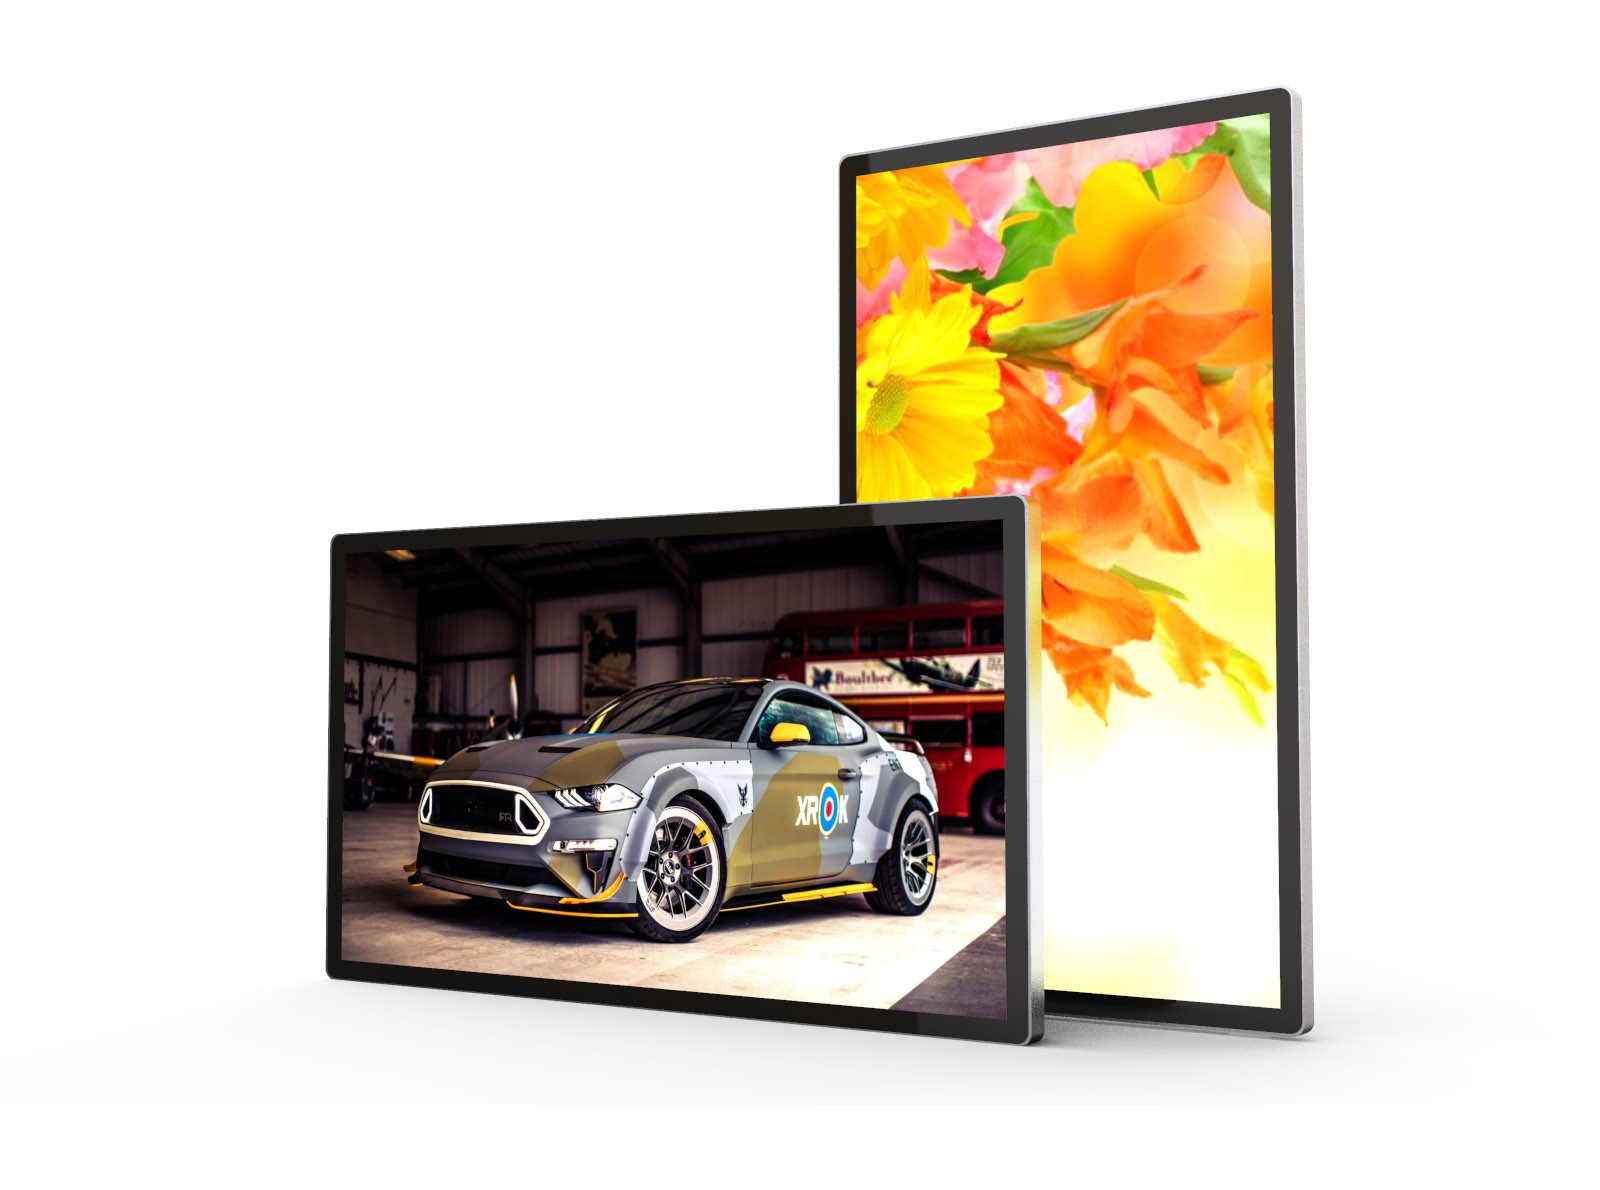 MG-GB320 Wall-mounted Digital Signage